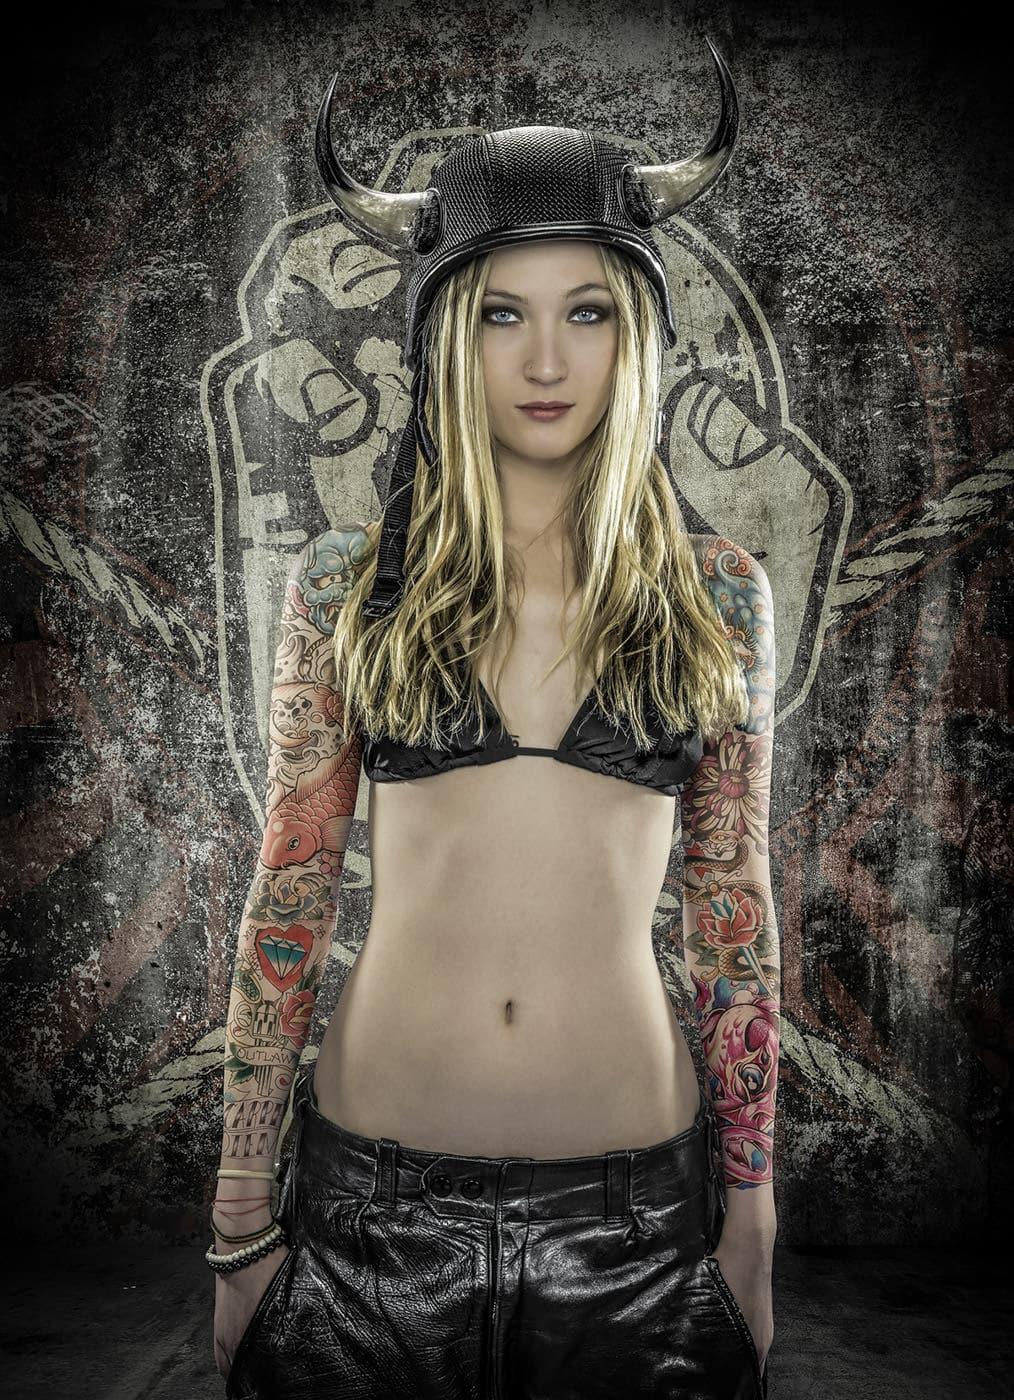 Retoque Fotografía Mujer Tatuajes